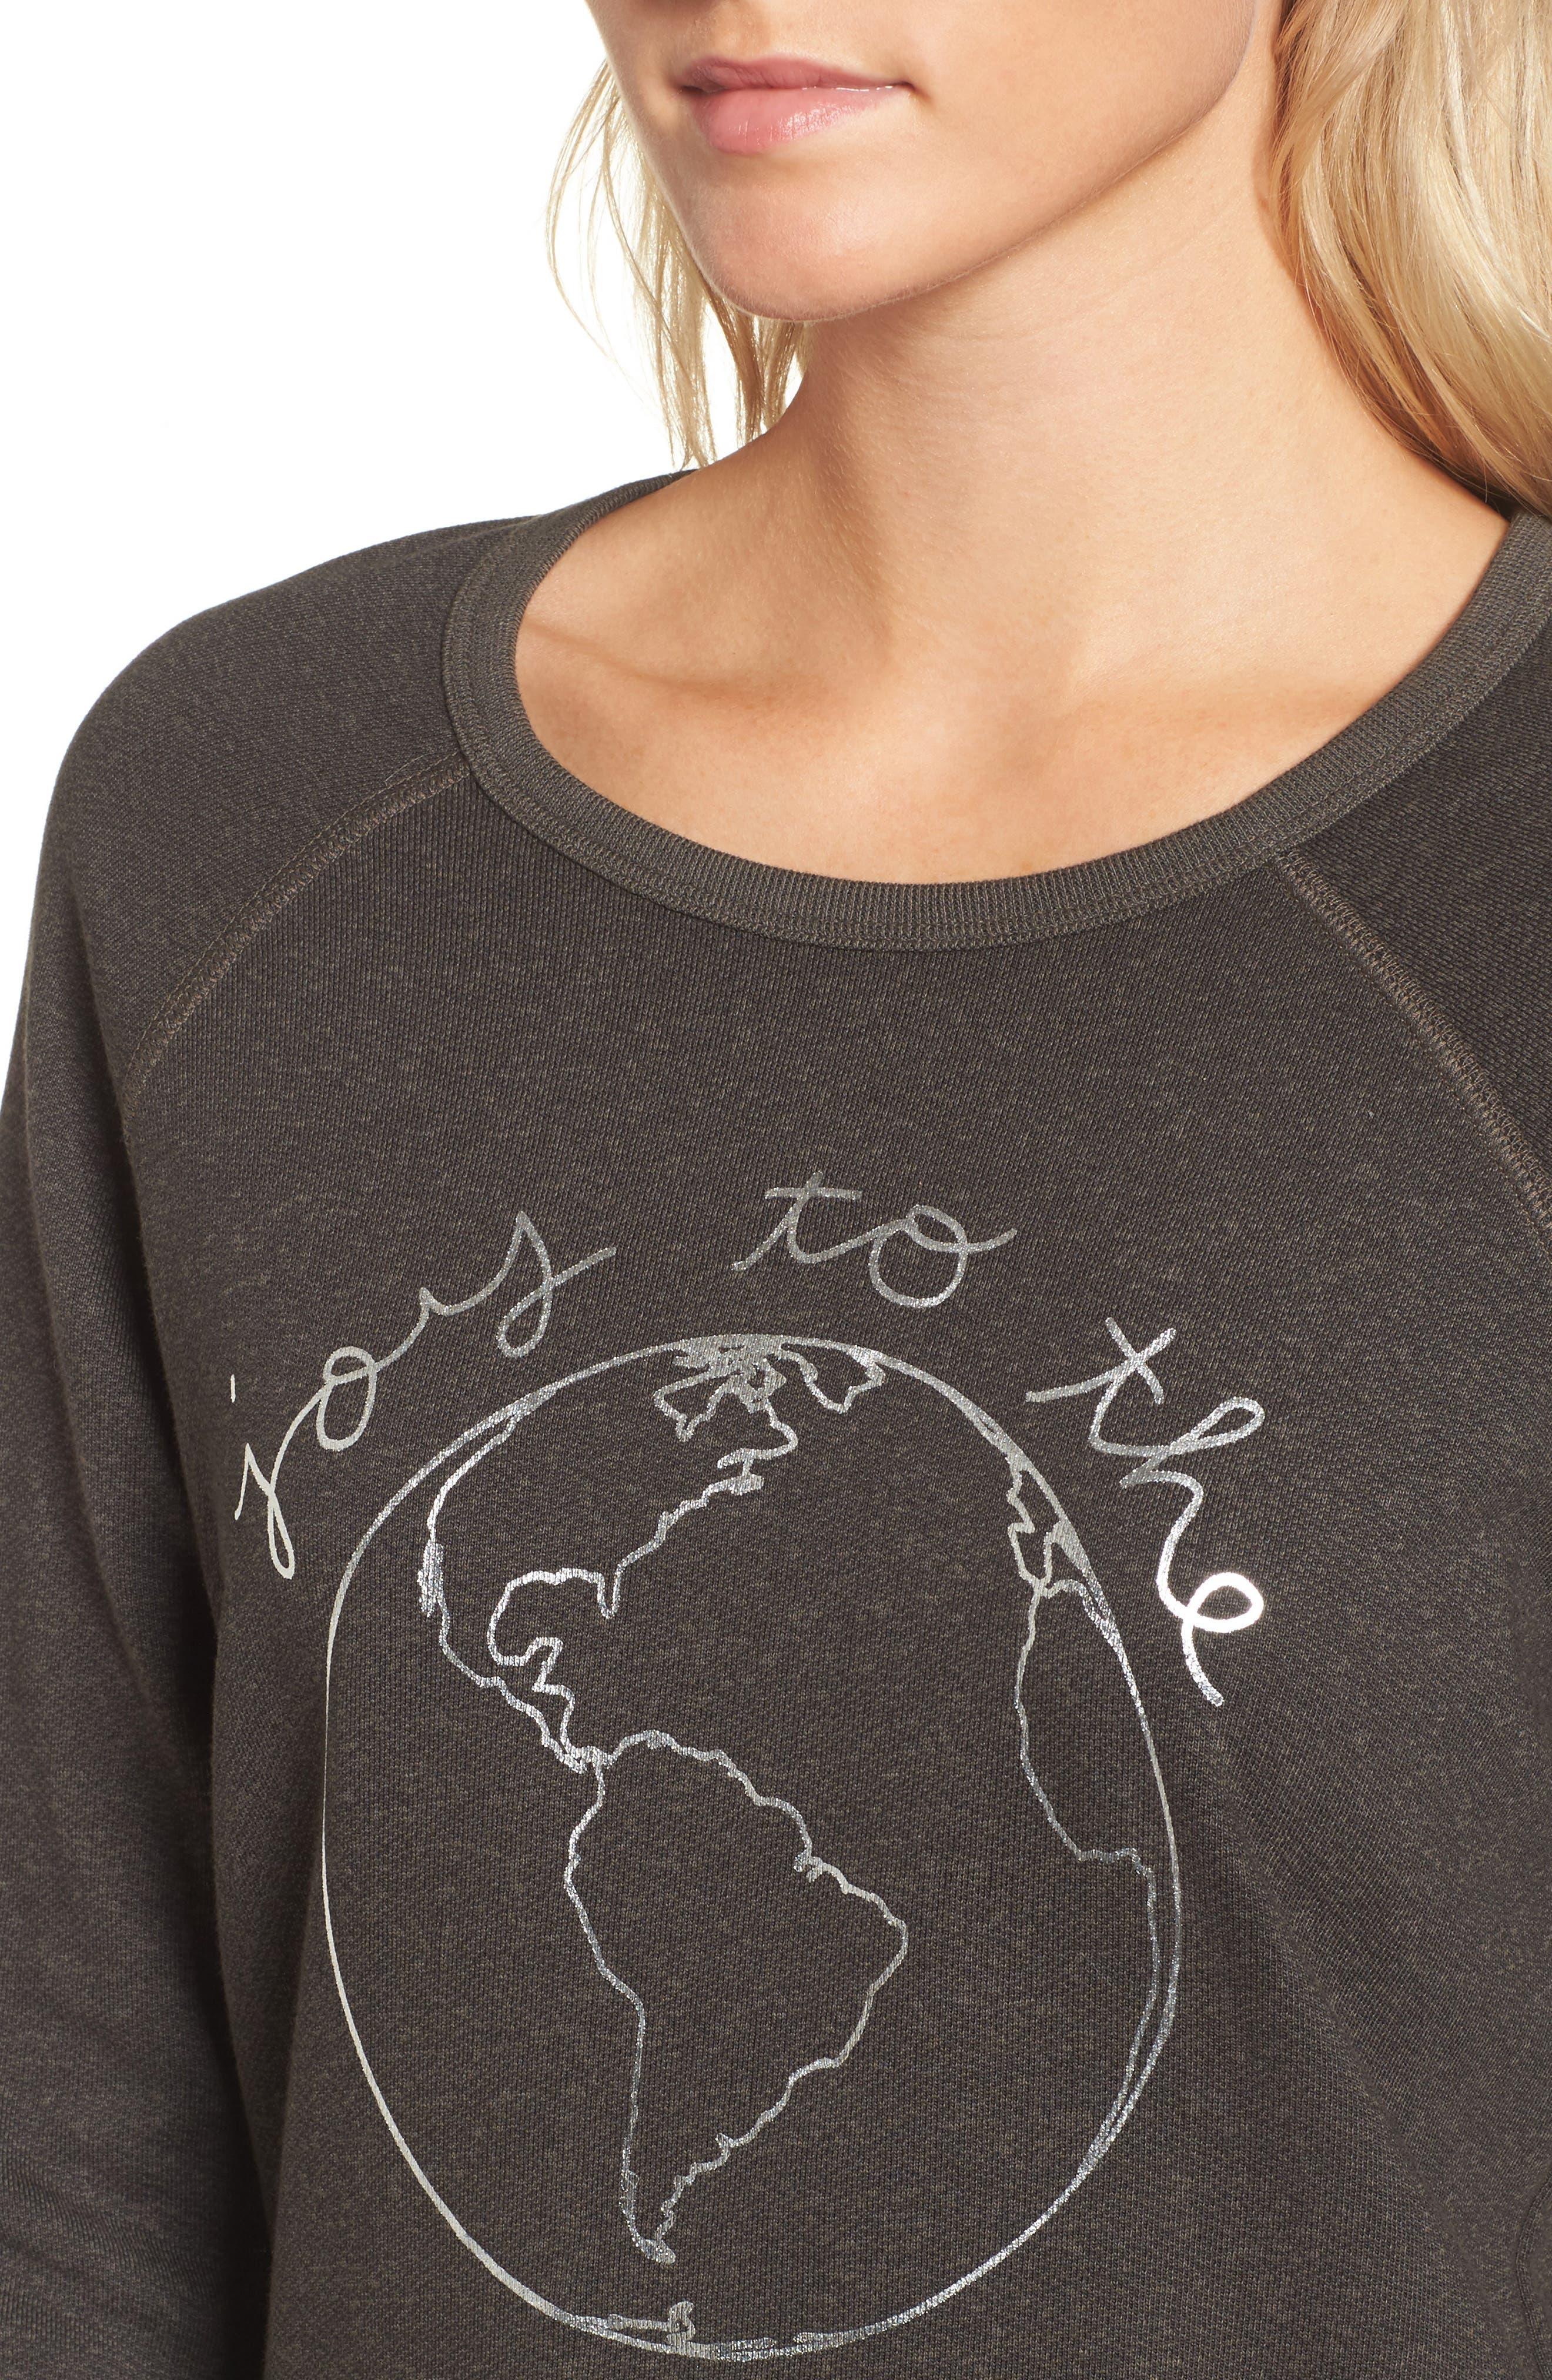 Joy to the World Sweatshirt,                             Alternate thumbnail 4, color,                             Black